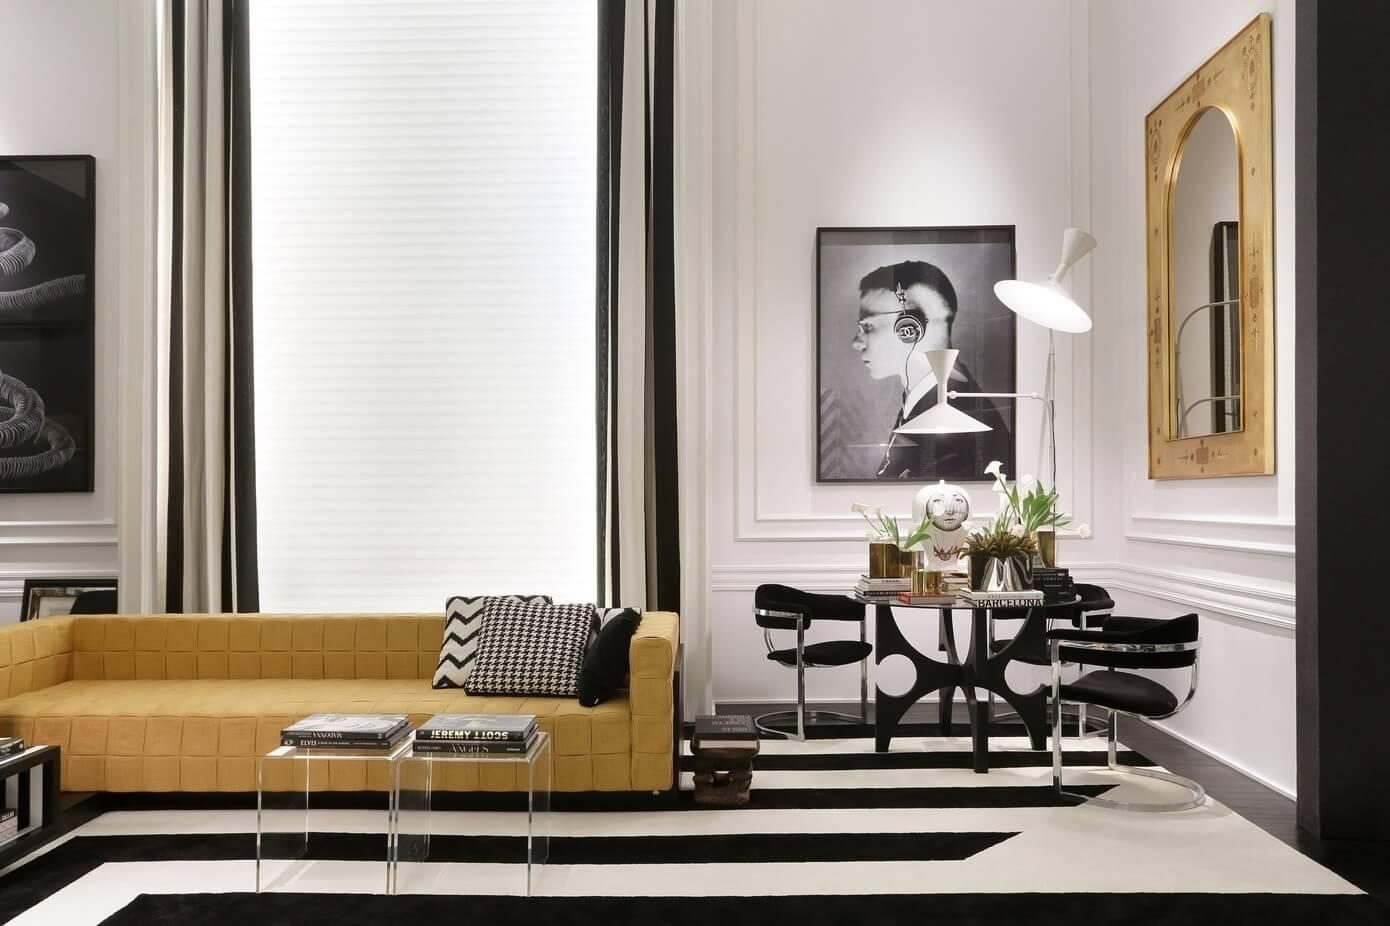 2015 Casa Cor Todeschini Pavilion-studio-guilherme-torres-06